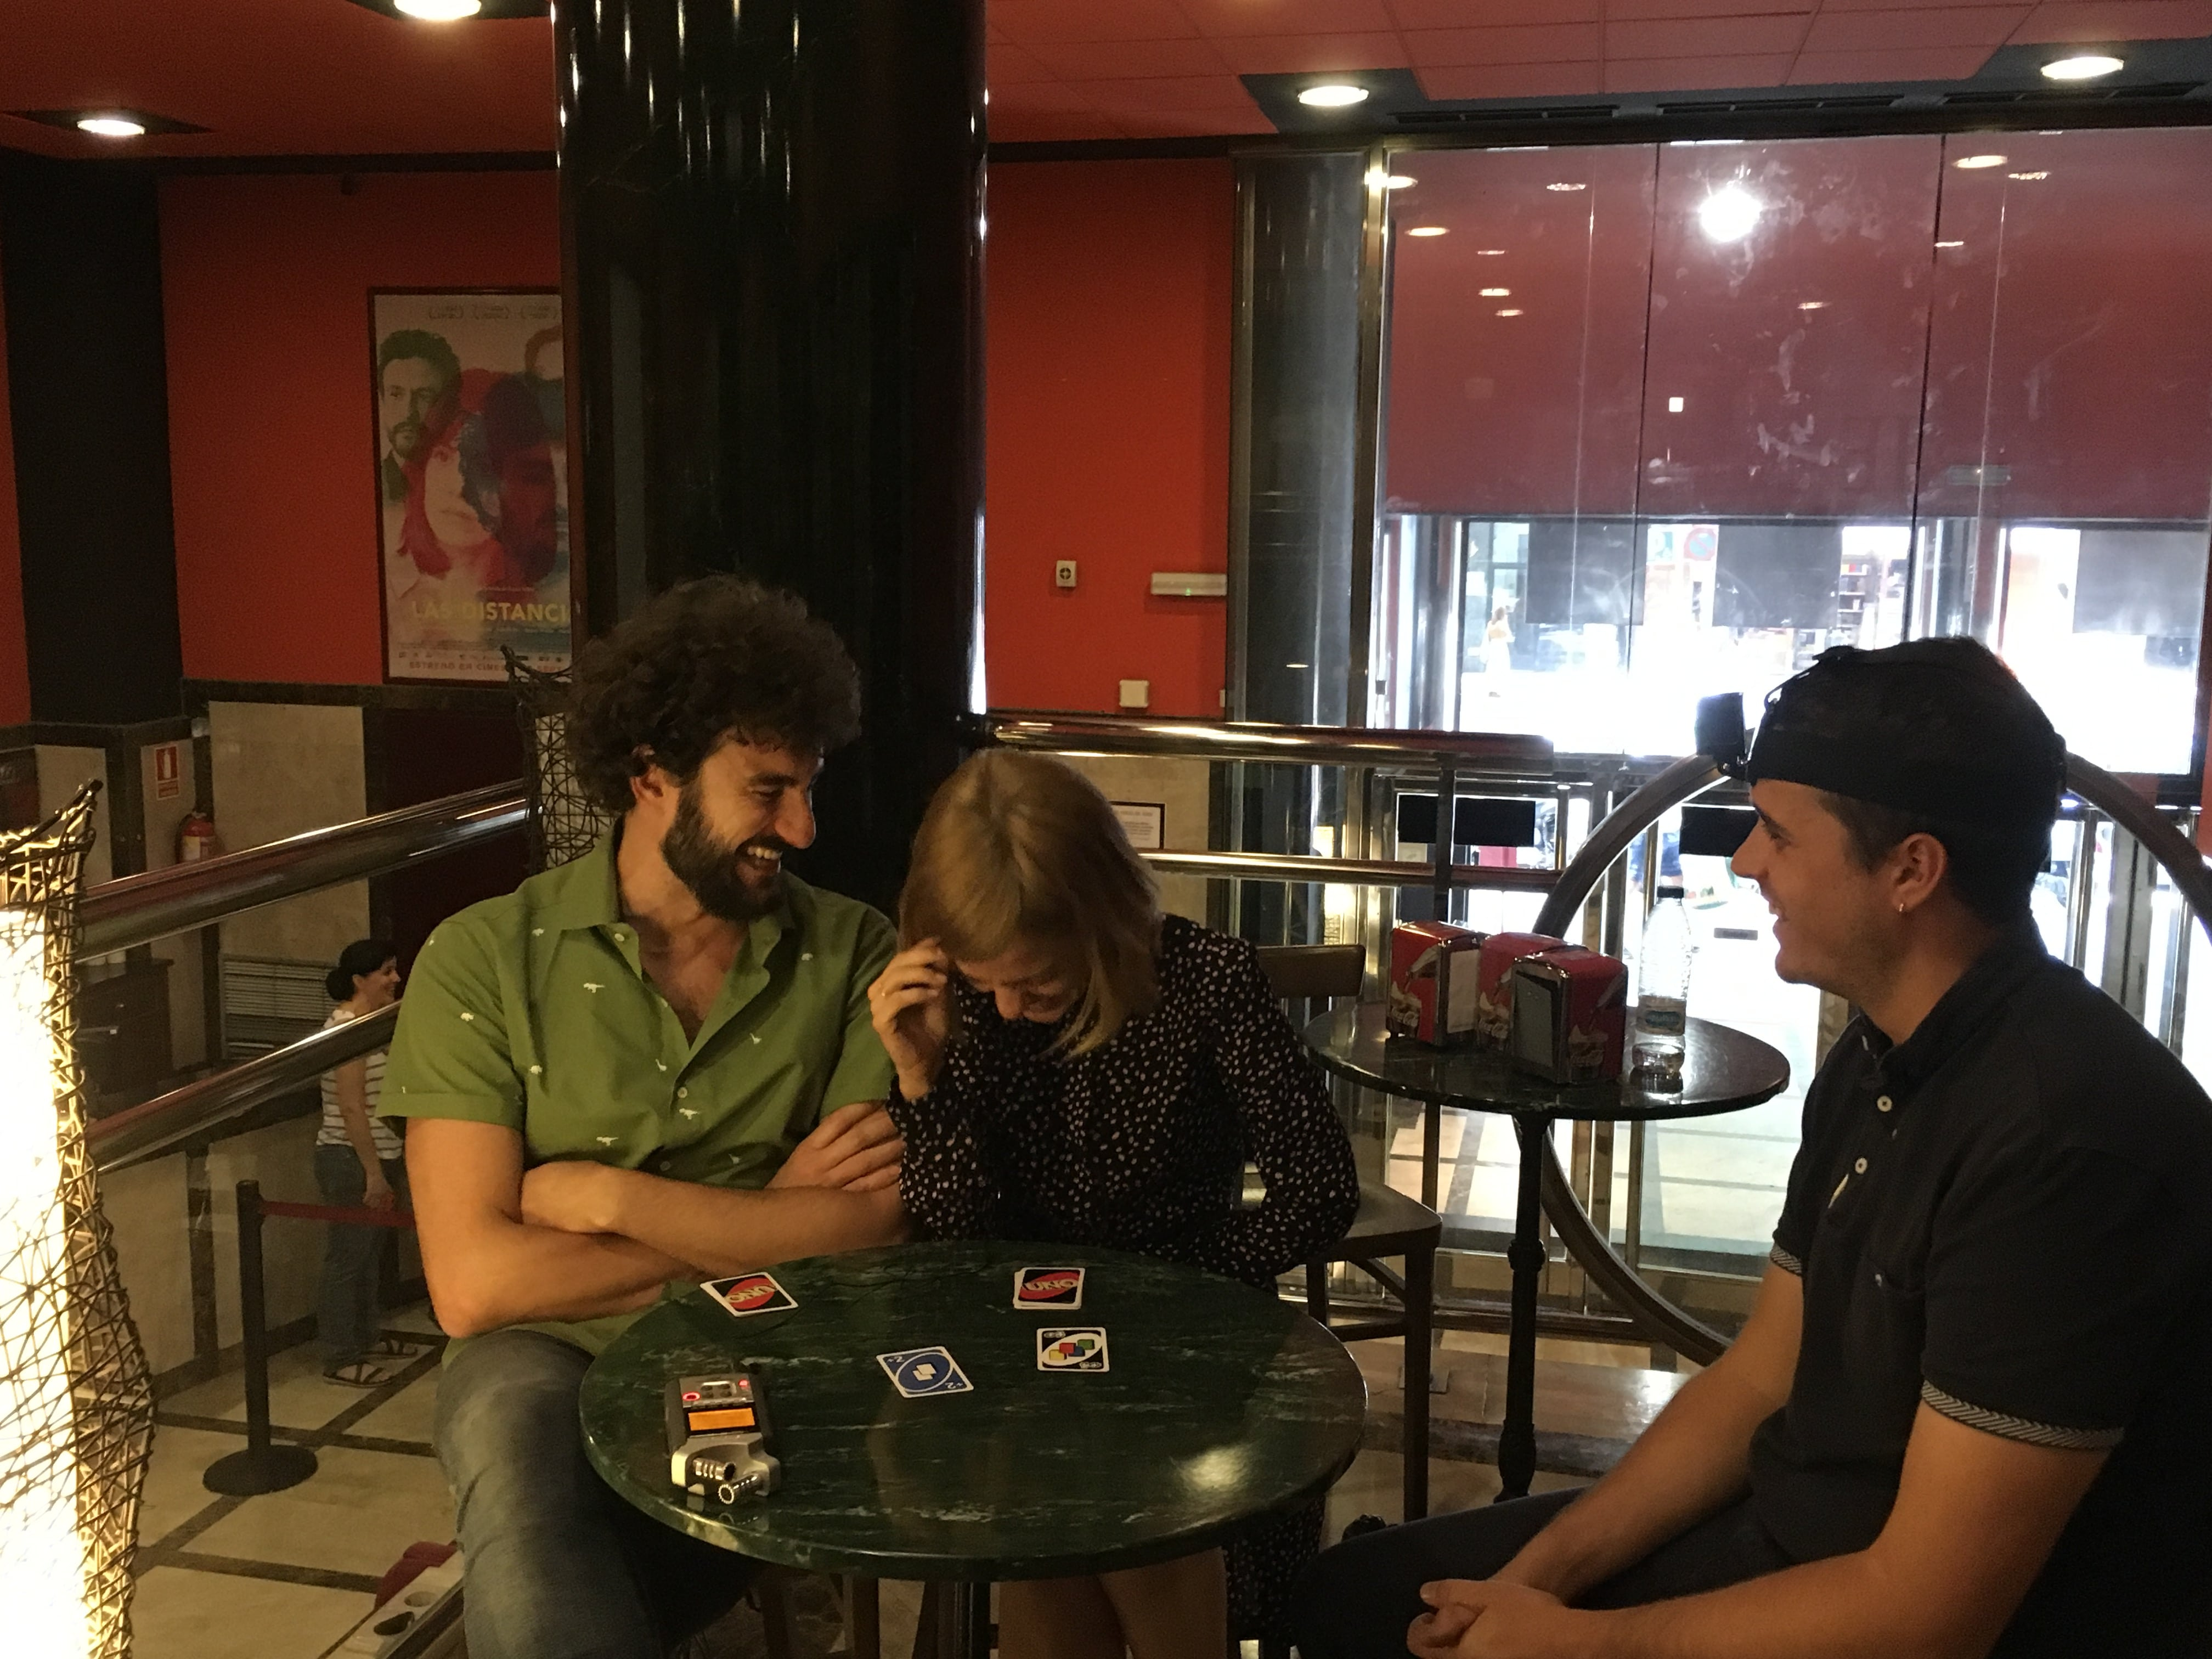 Peli o Manta. Entrevista Alexandra Jiménez y Miki Esparbé. Las distancias